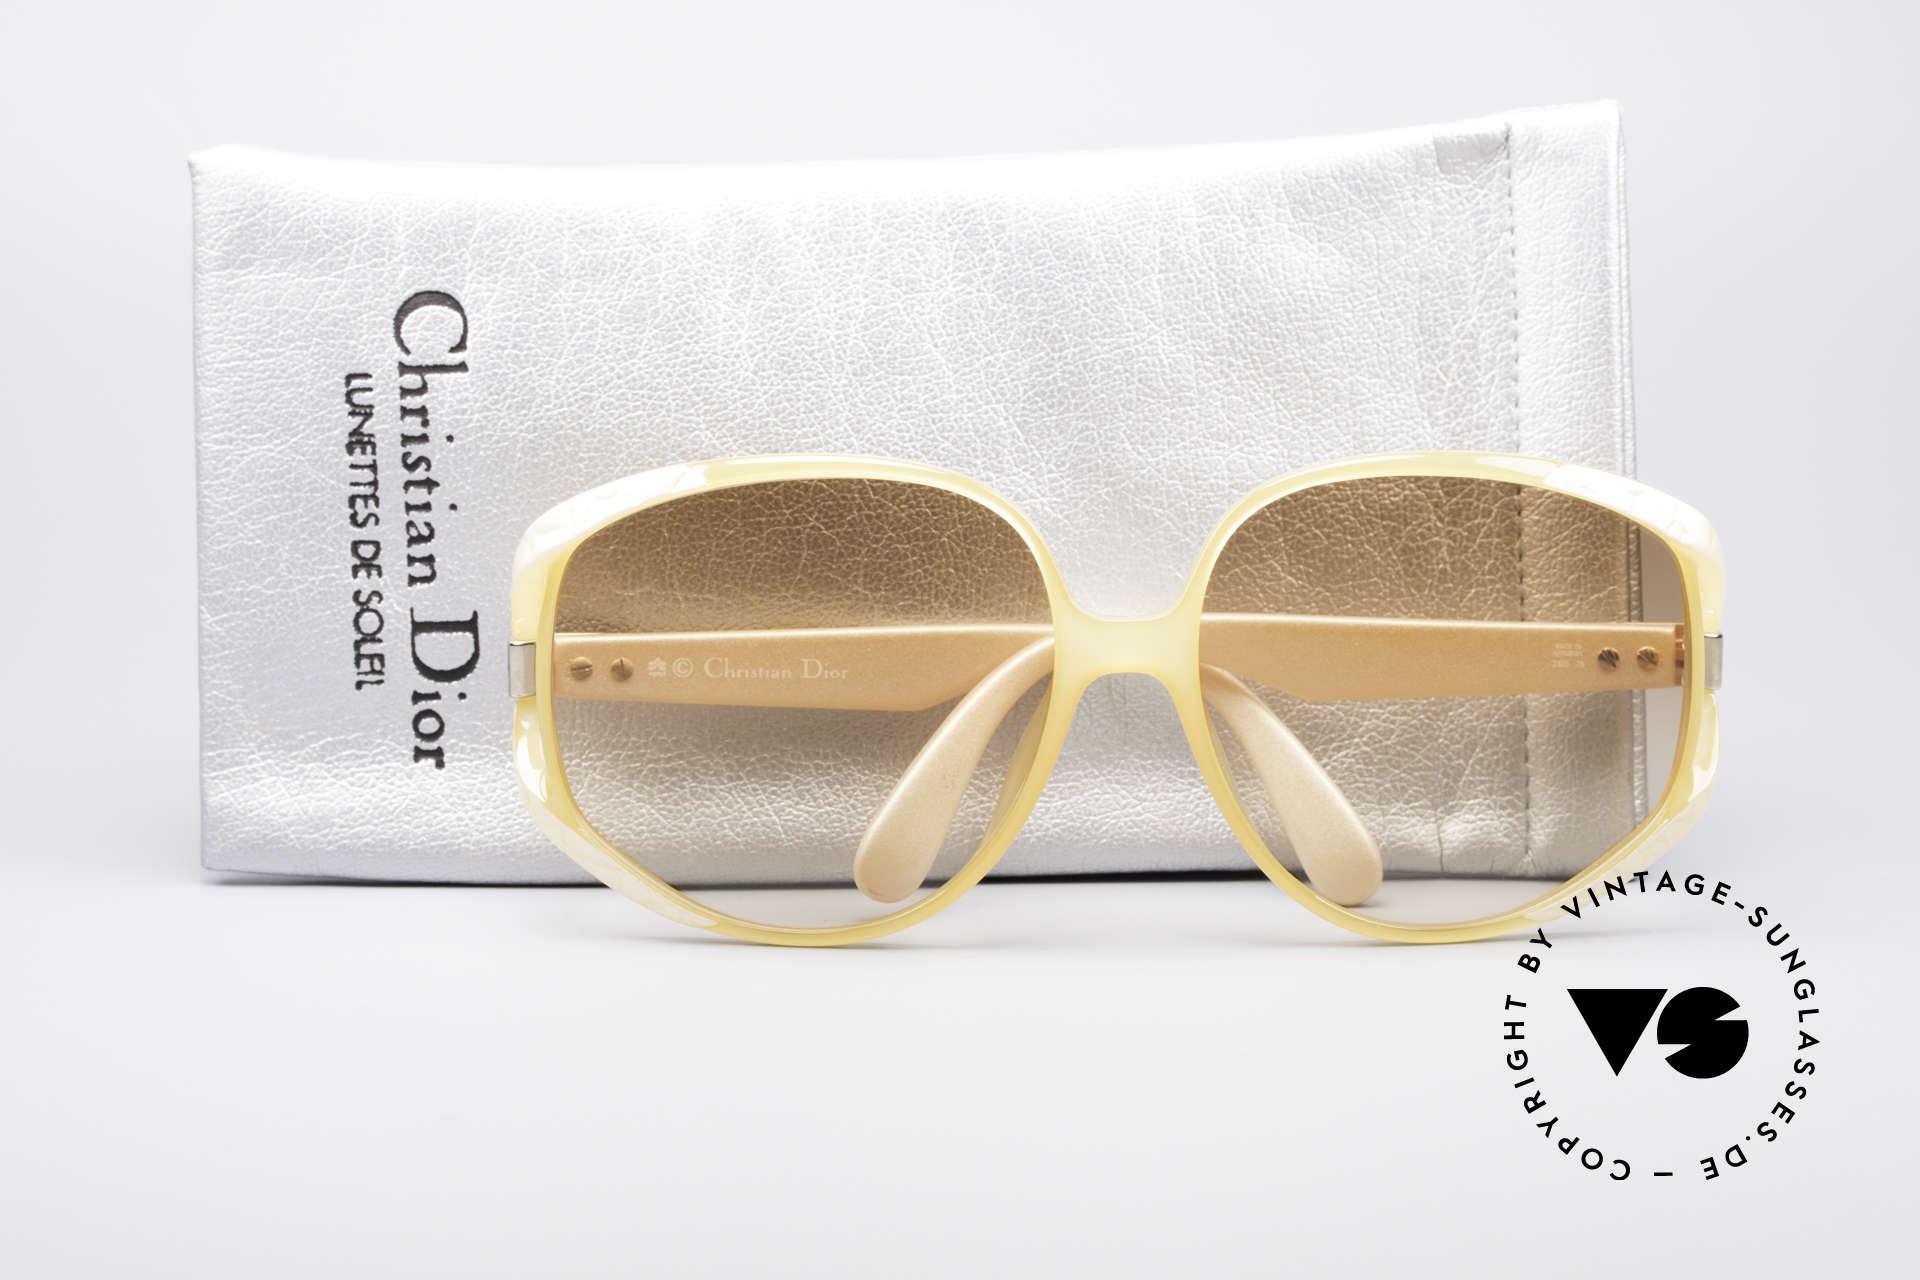 Christian Dior 2320 Rare 80's Ladies XL Sunglasses, a true eye-catcher & authentic Dior designer piece, Made for Women